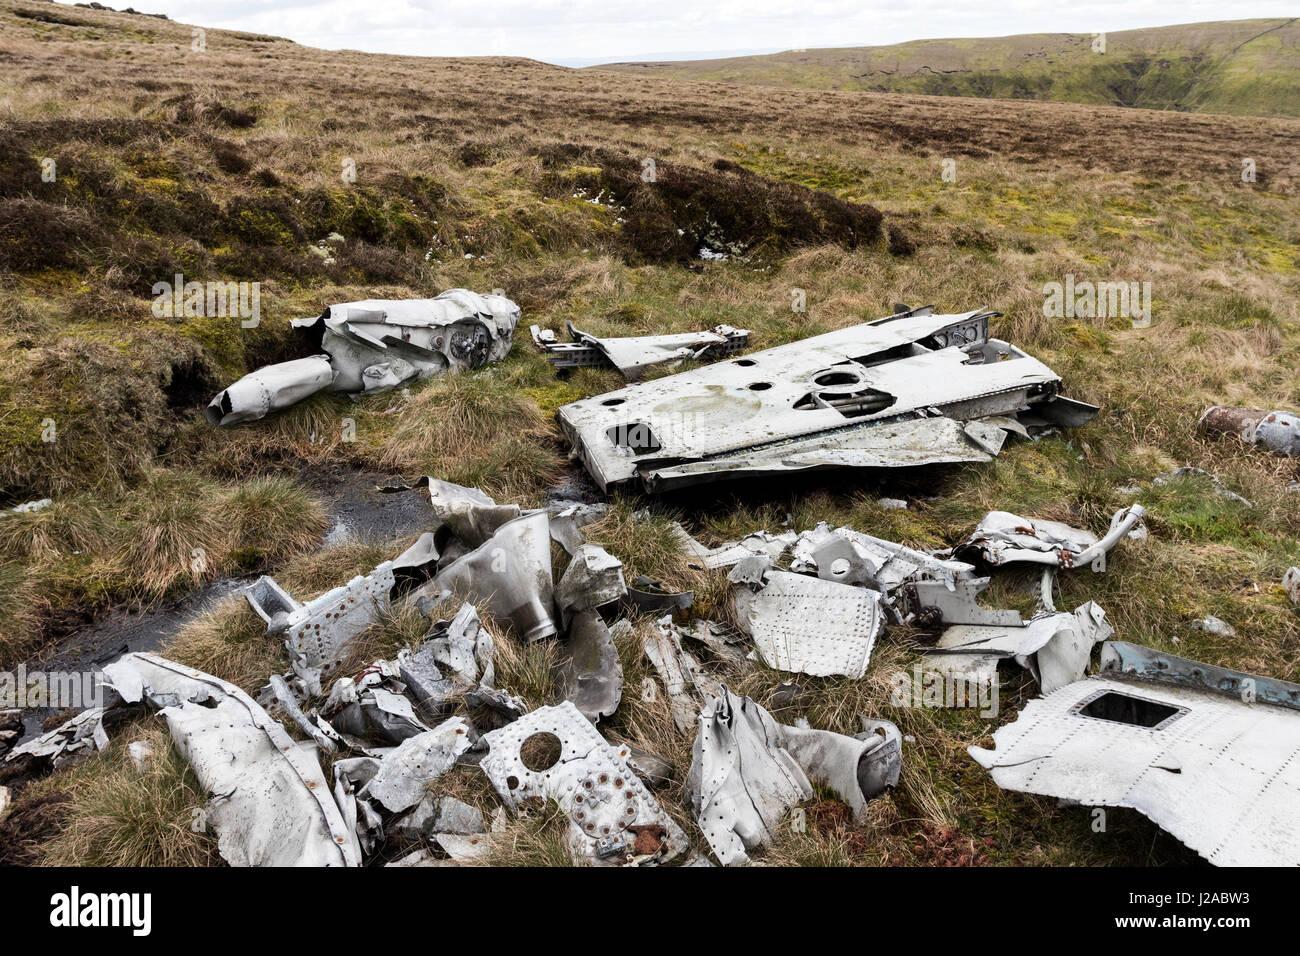 The wreckage of an RAF, De Havilland Venom Mk4, Serial No WR557, of No.22 Maintenance Unit which crashed near Farlam - Stock Image